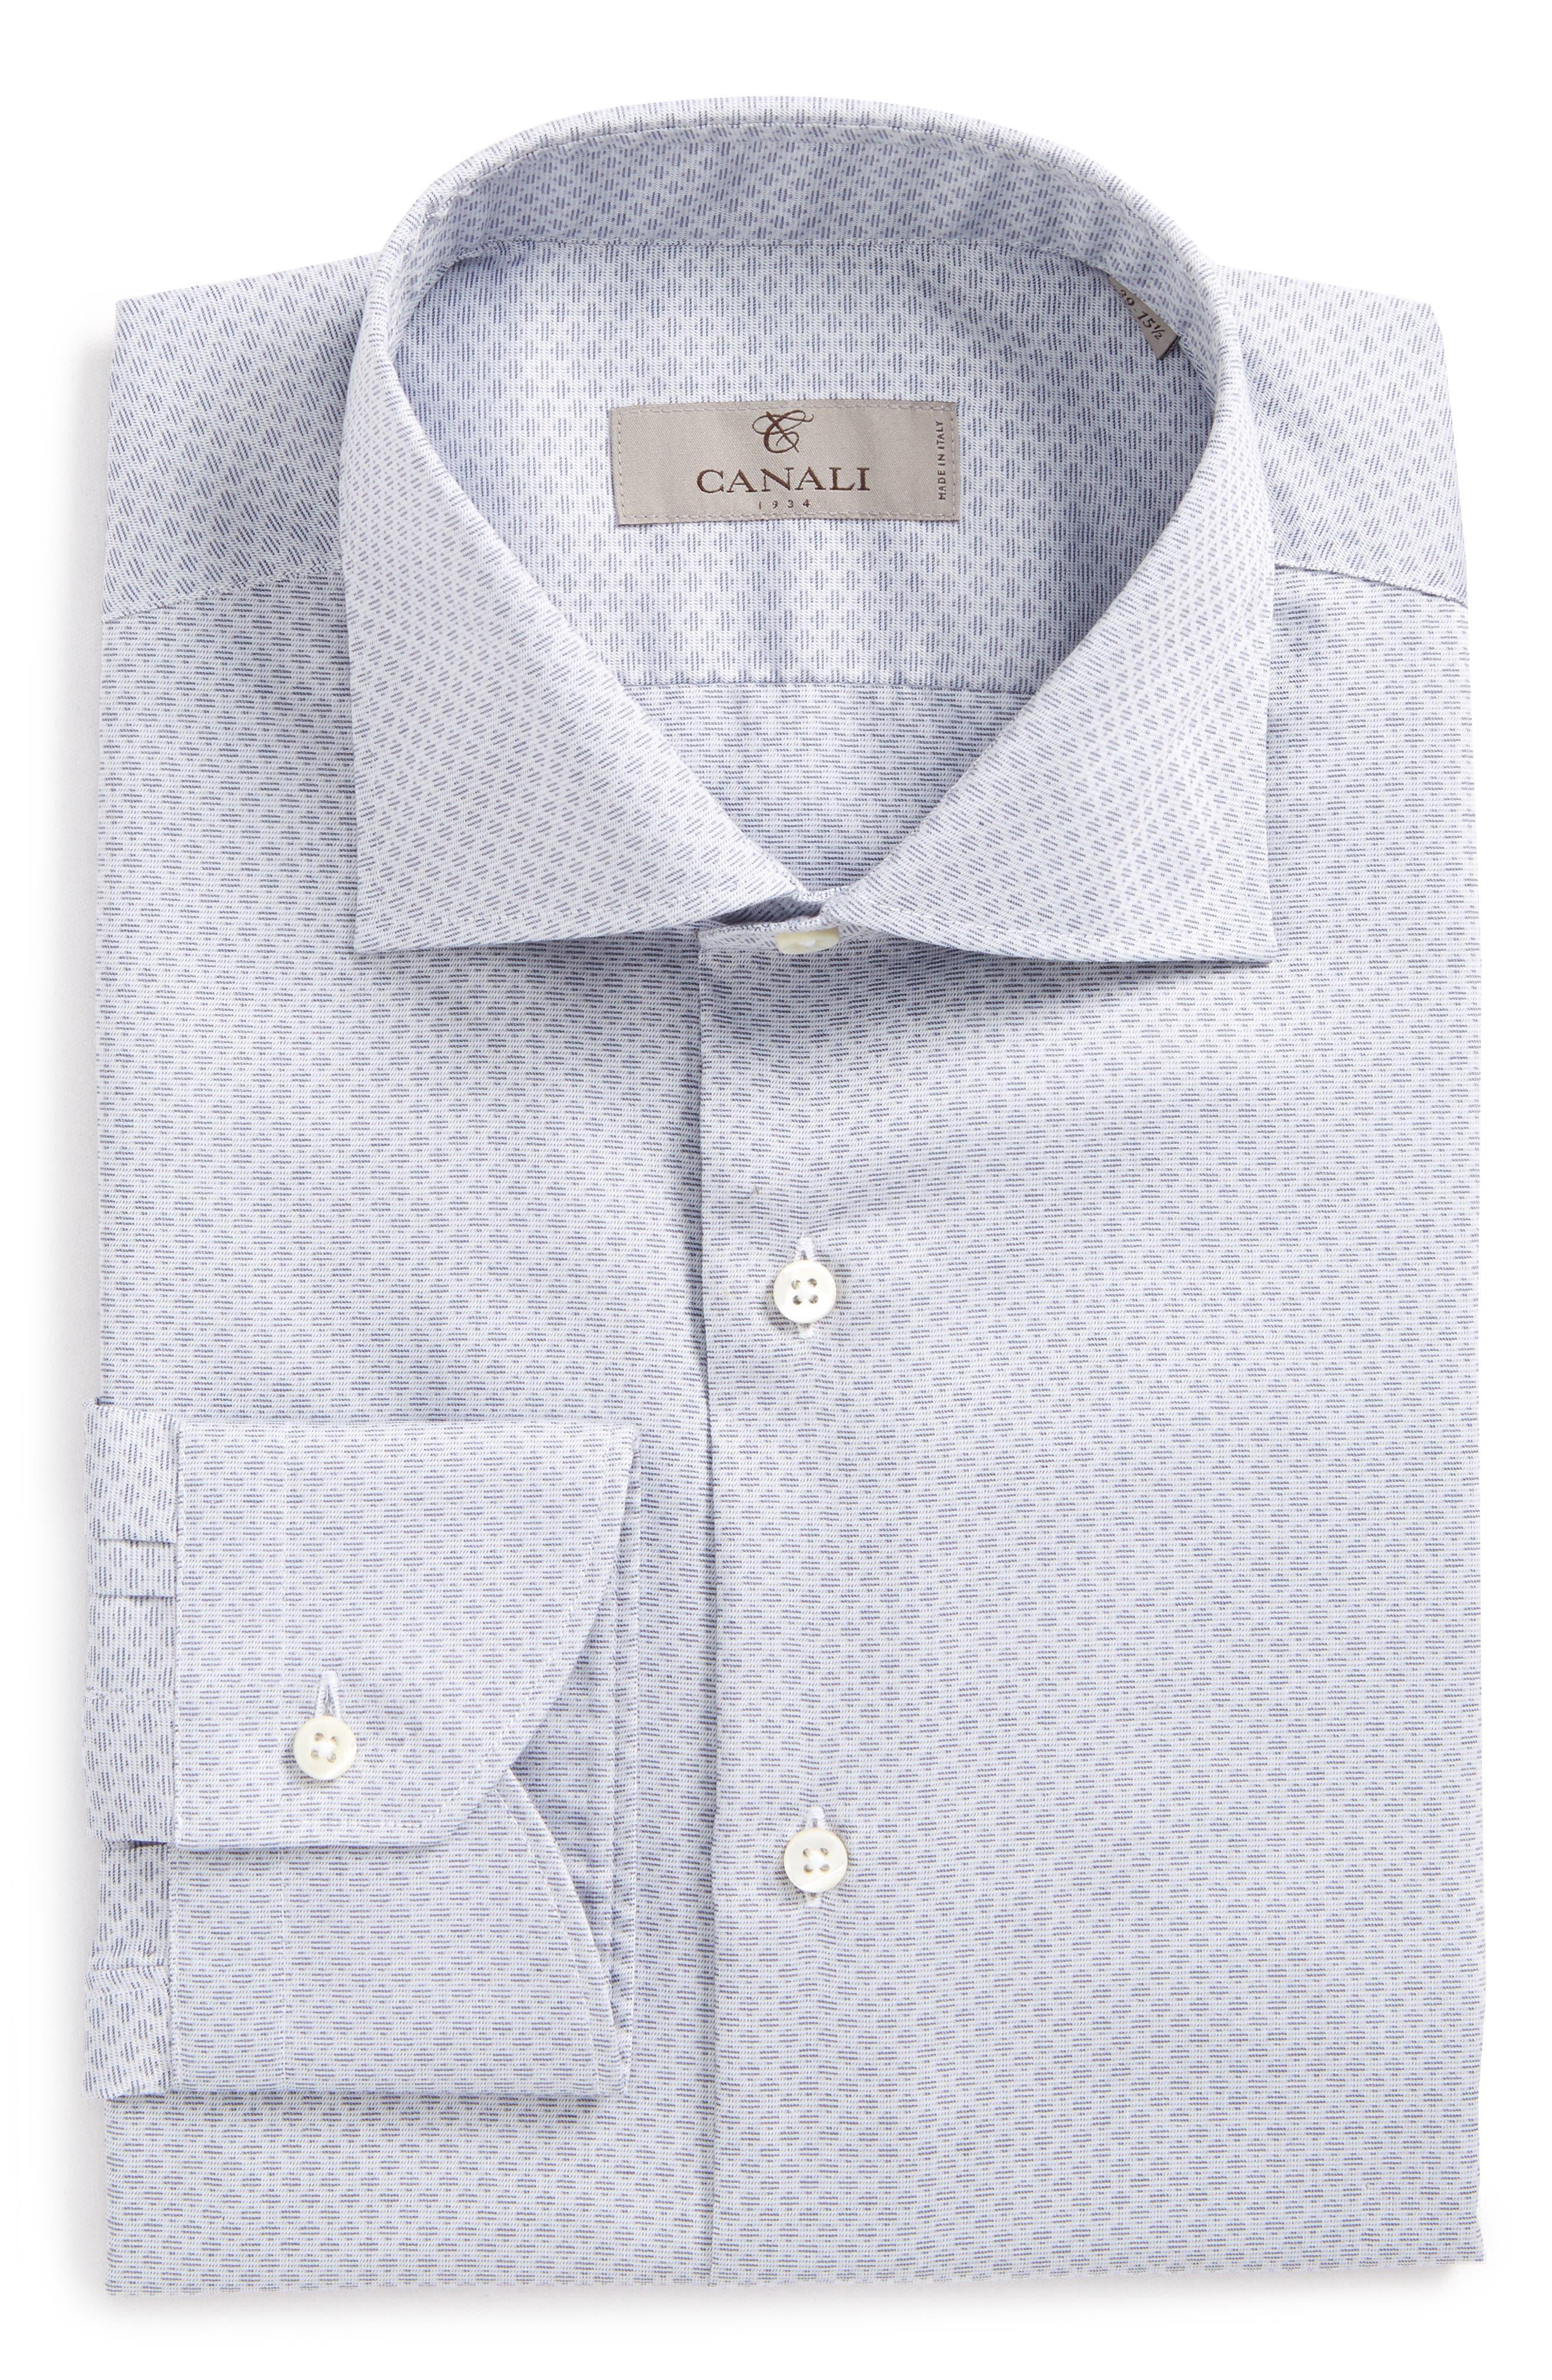 Regular Fit Geometric Dress Shirt,                             Main thumbnail 1, color,                             GREY